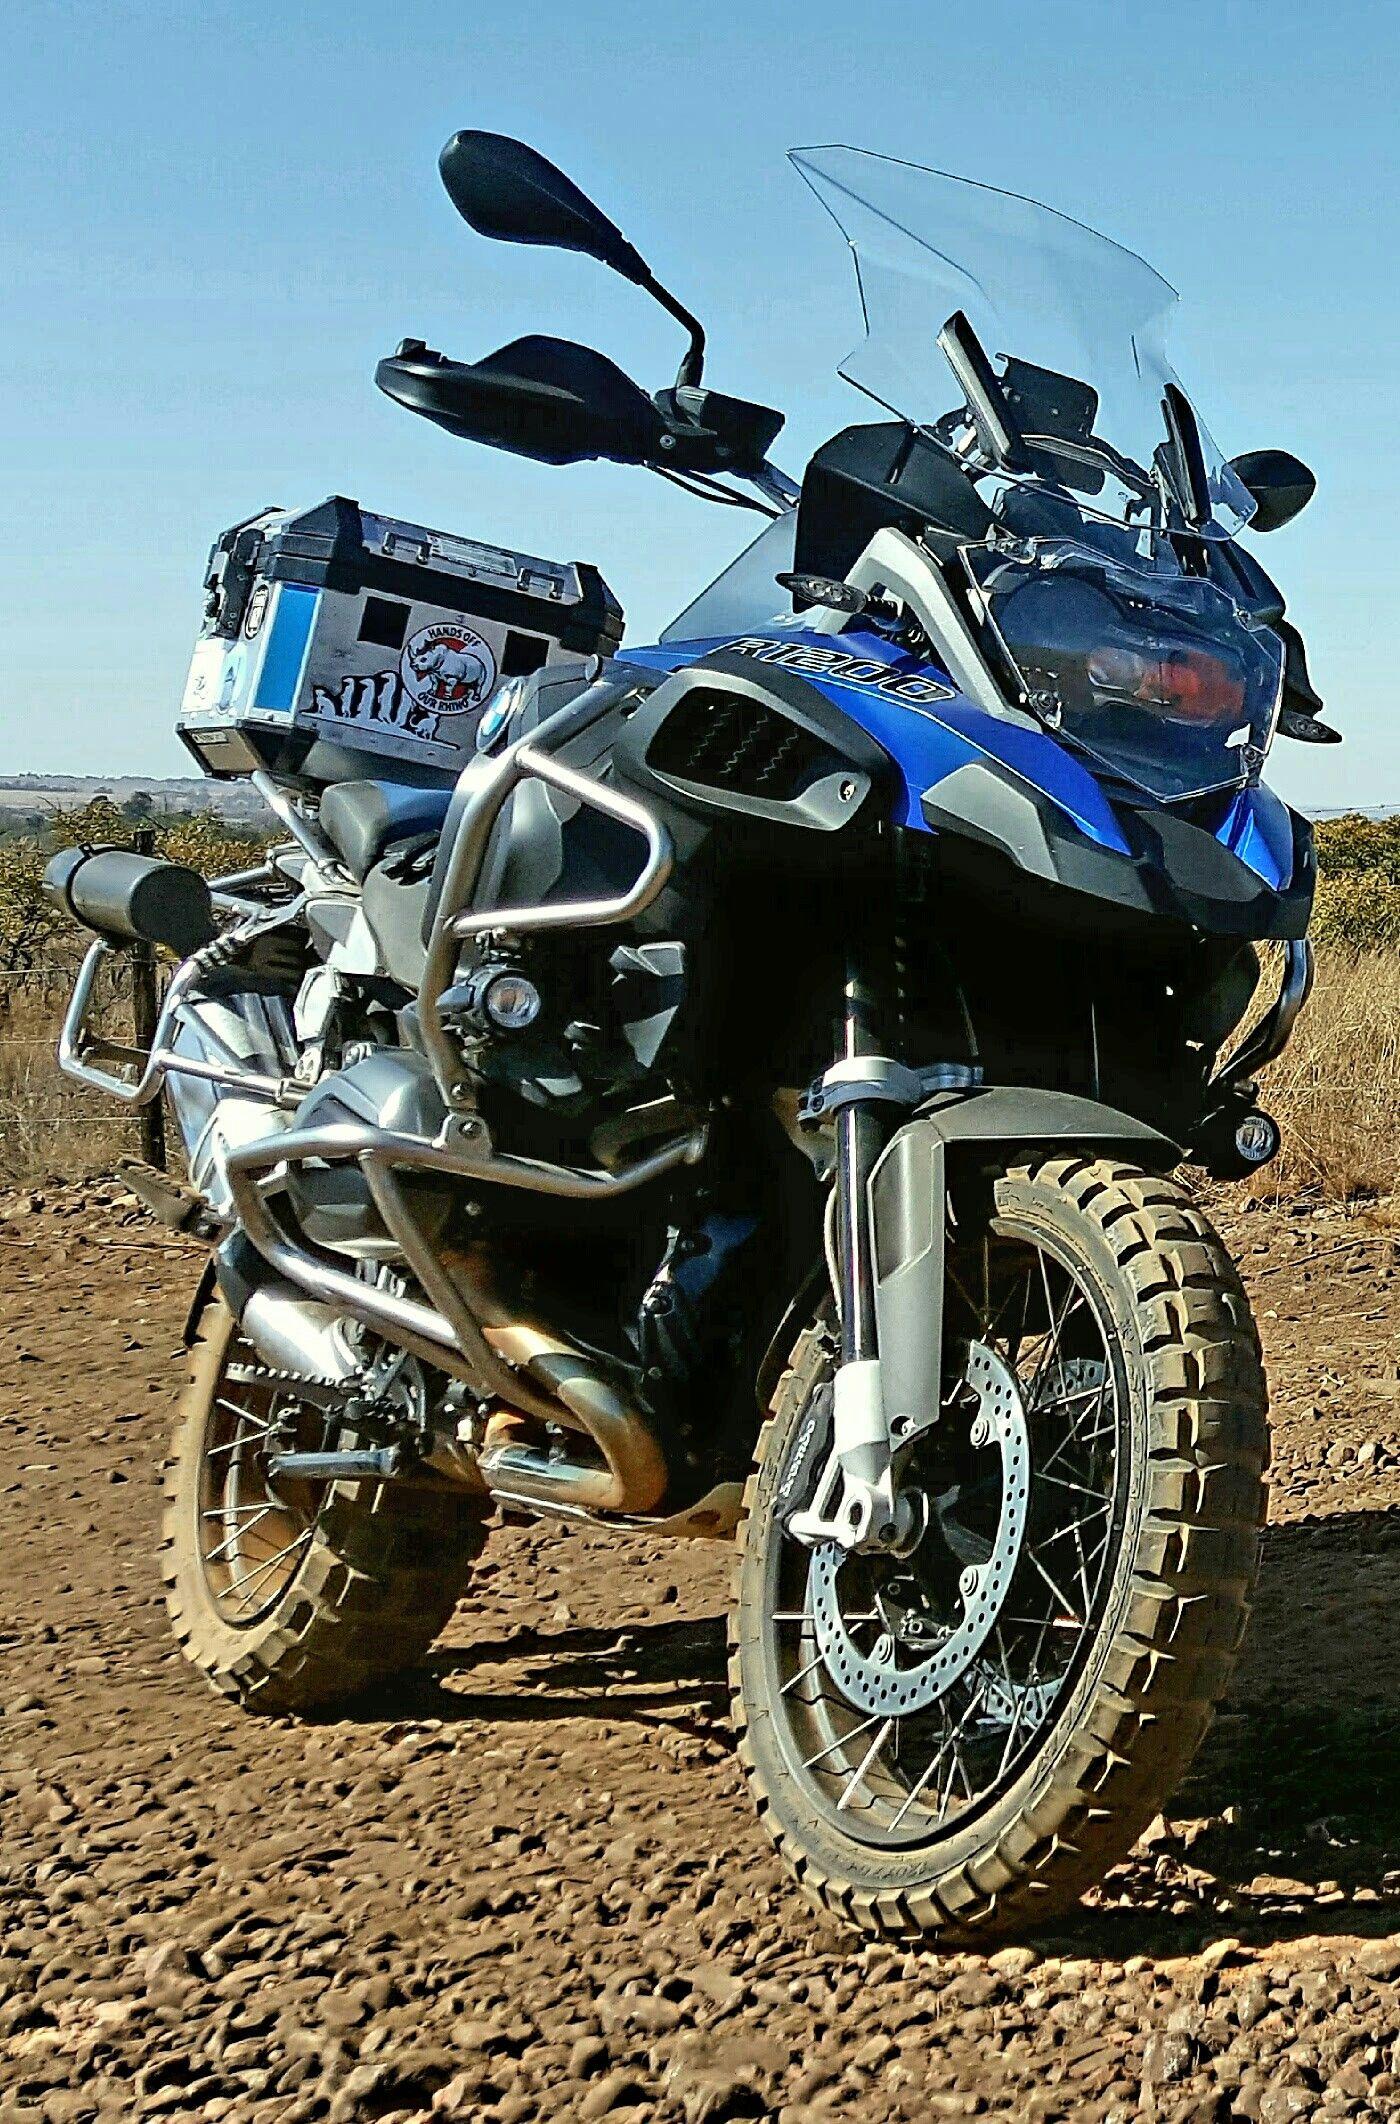 Motorcycles | Bmw motorbikes, Bike bmw, Touring bike